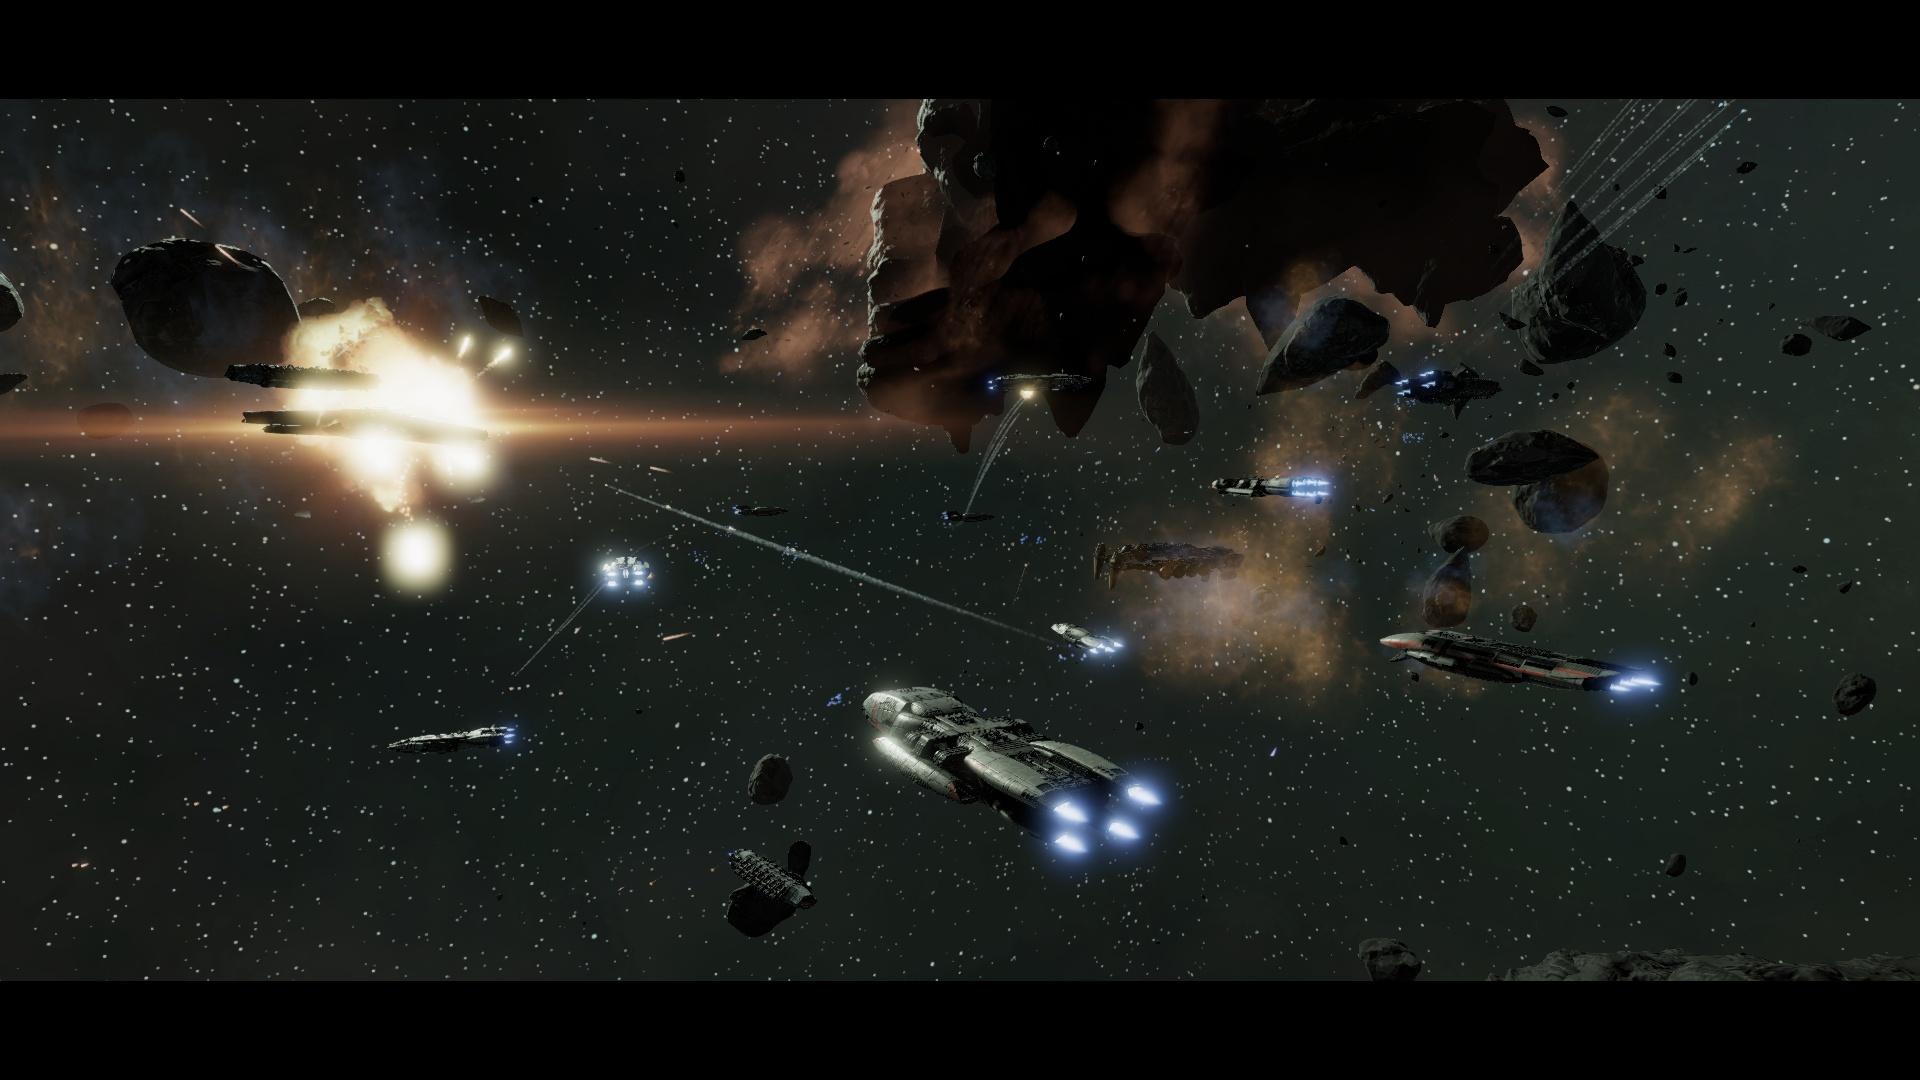 Battlestar Galactica Deadlock